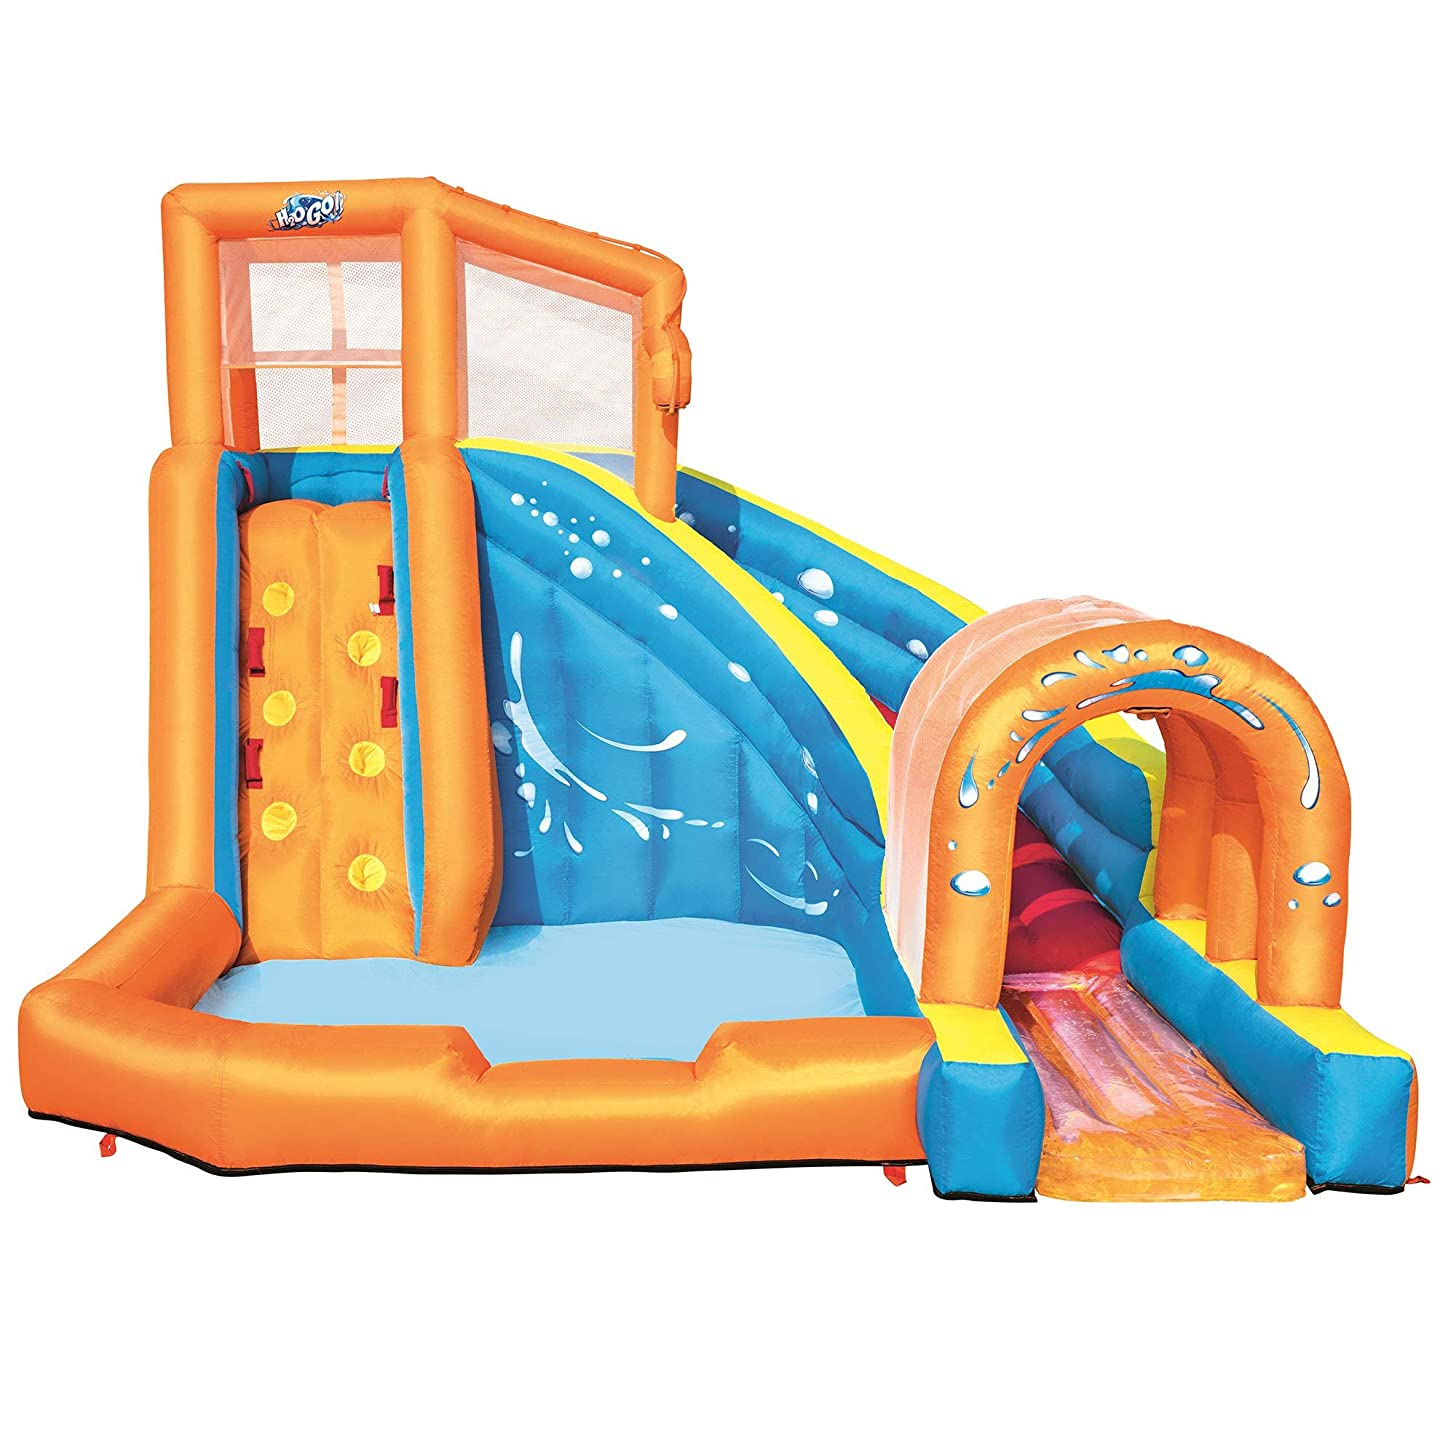 H2OGO! Hurricane Tunnel Blast Mega Inflatable Summer Family Water Park, Multicolored